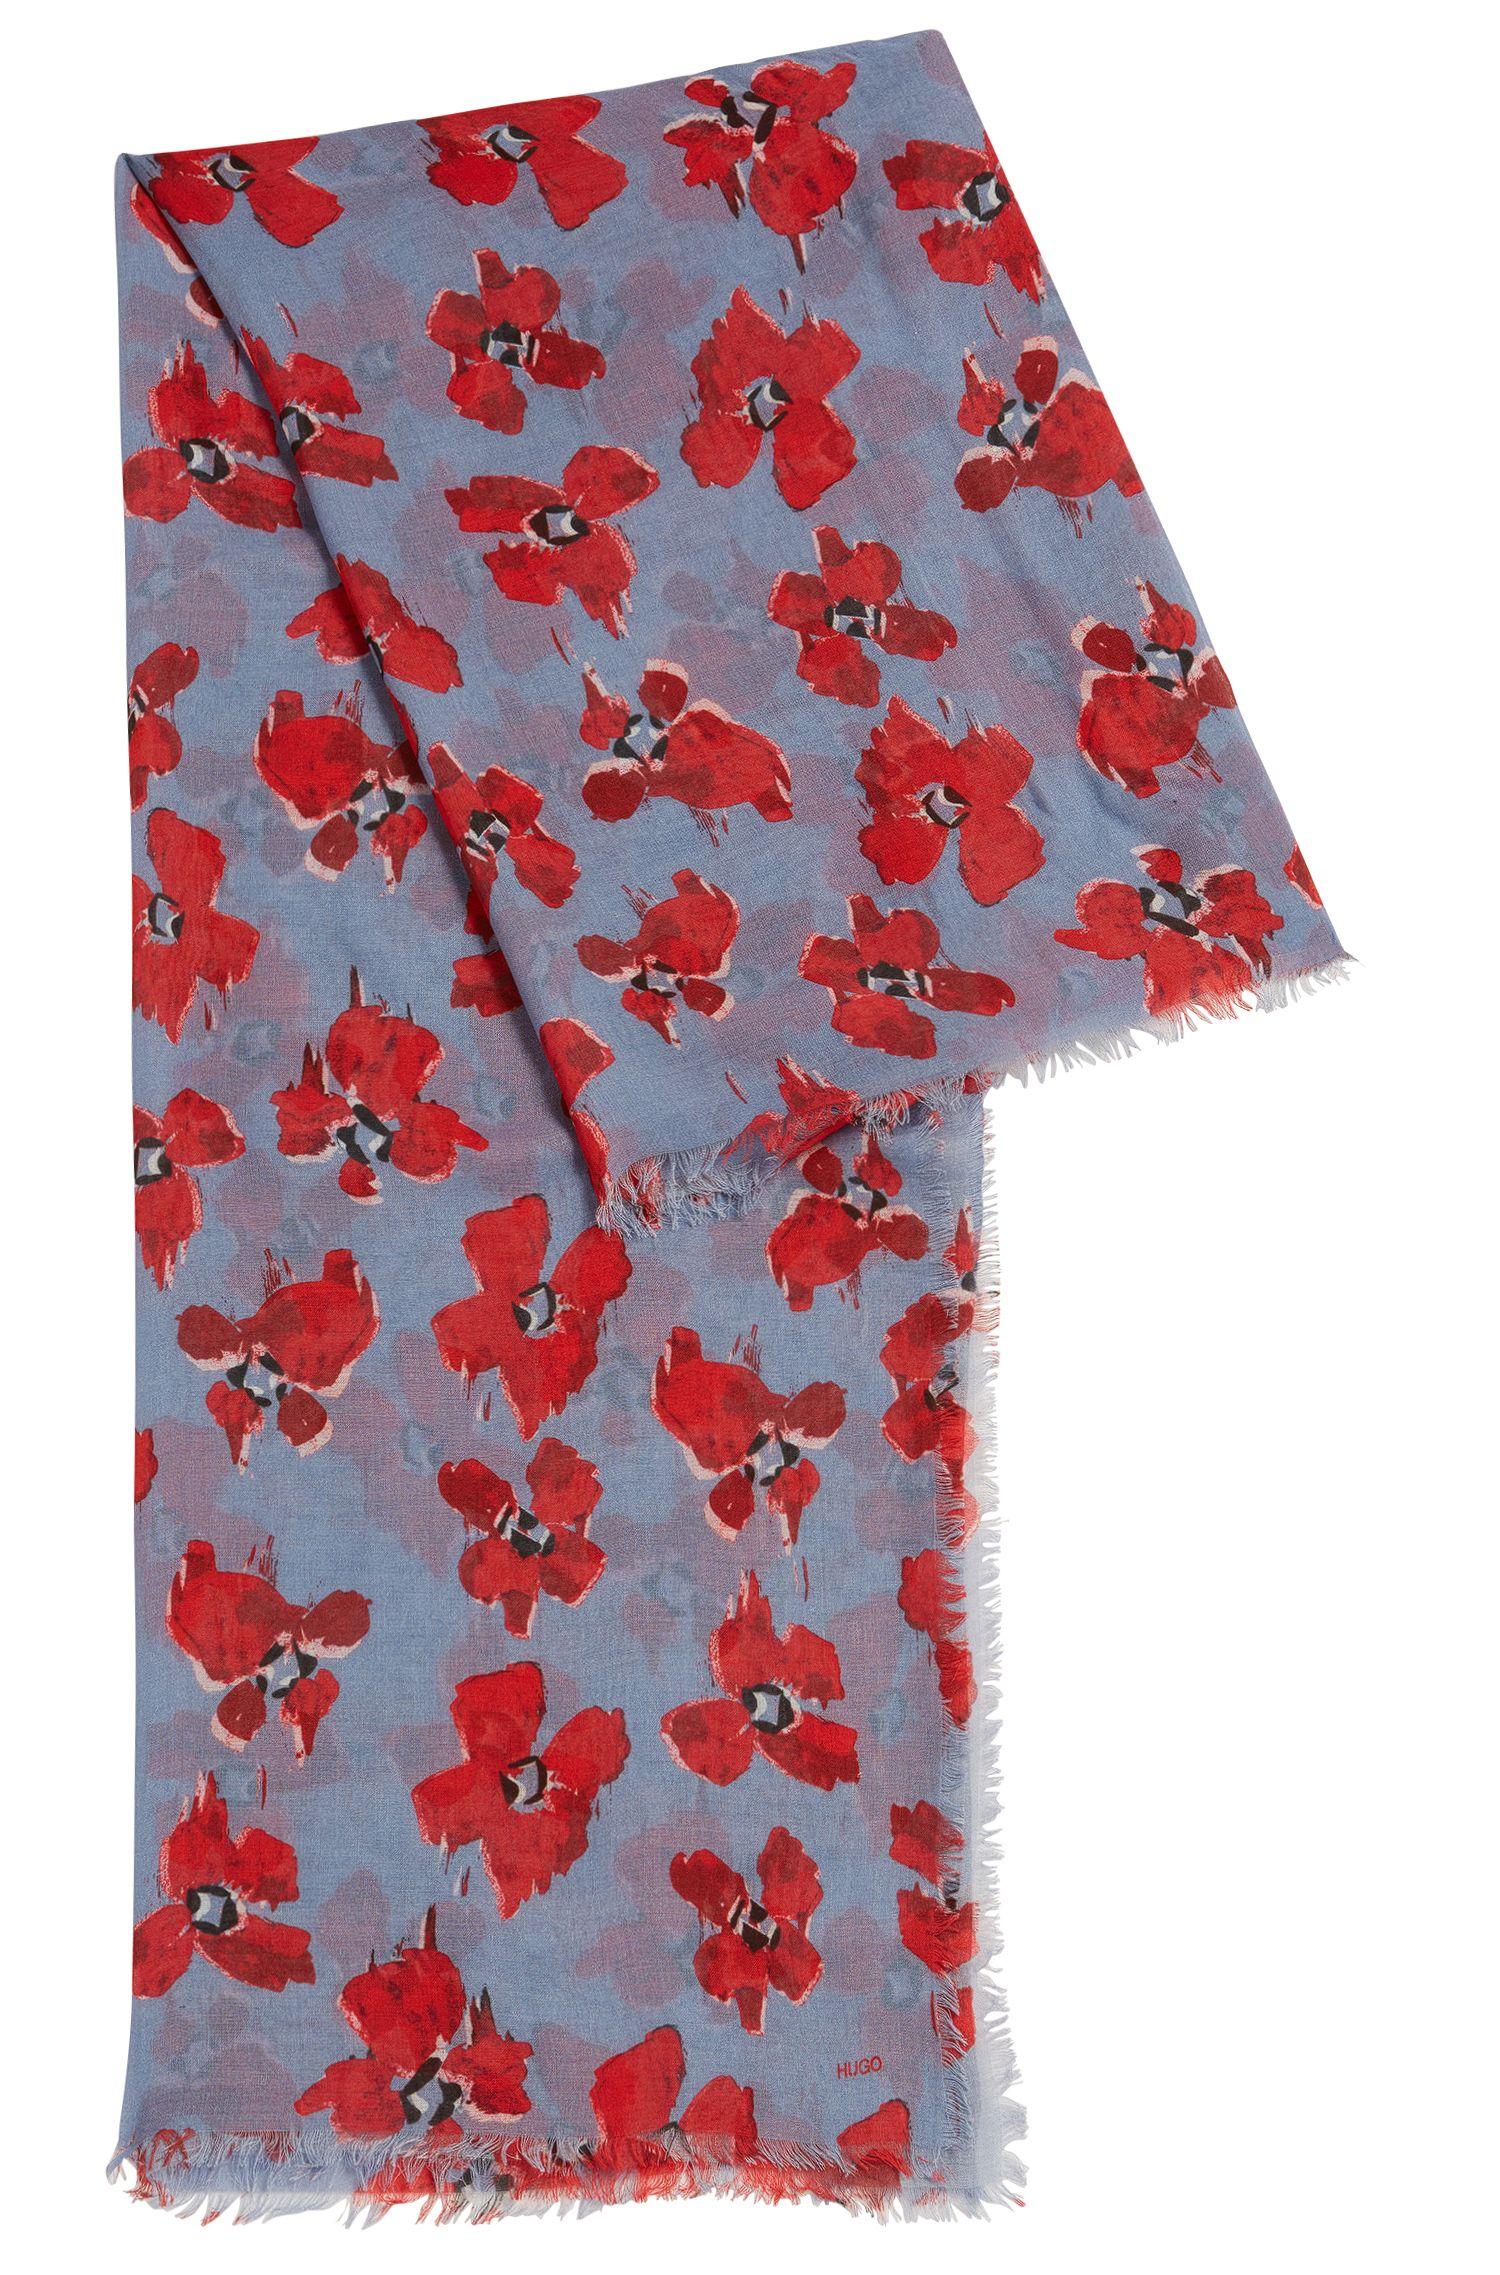 Pañuelo ligero en exquisito modal con estampado de flores